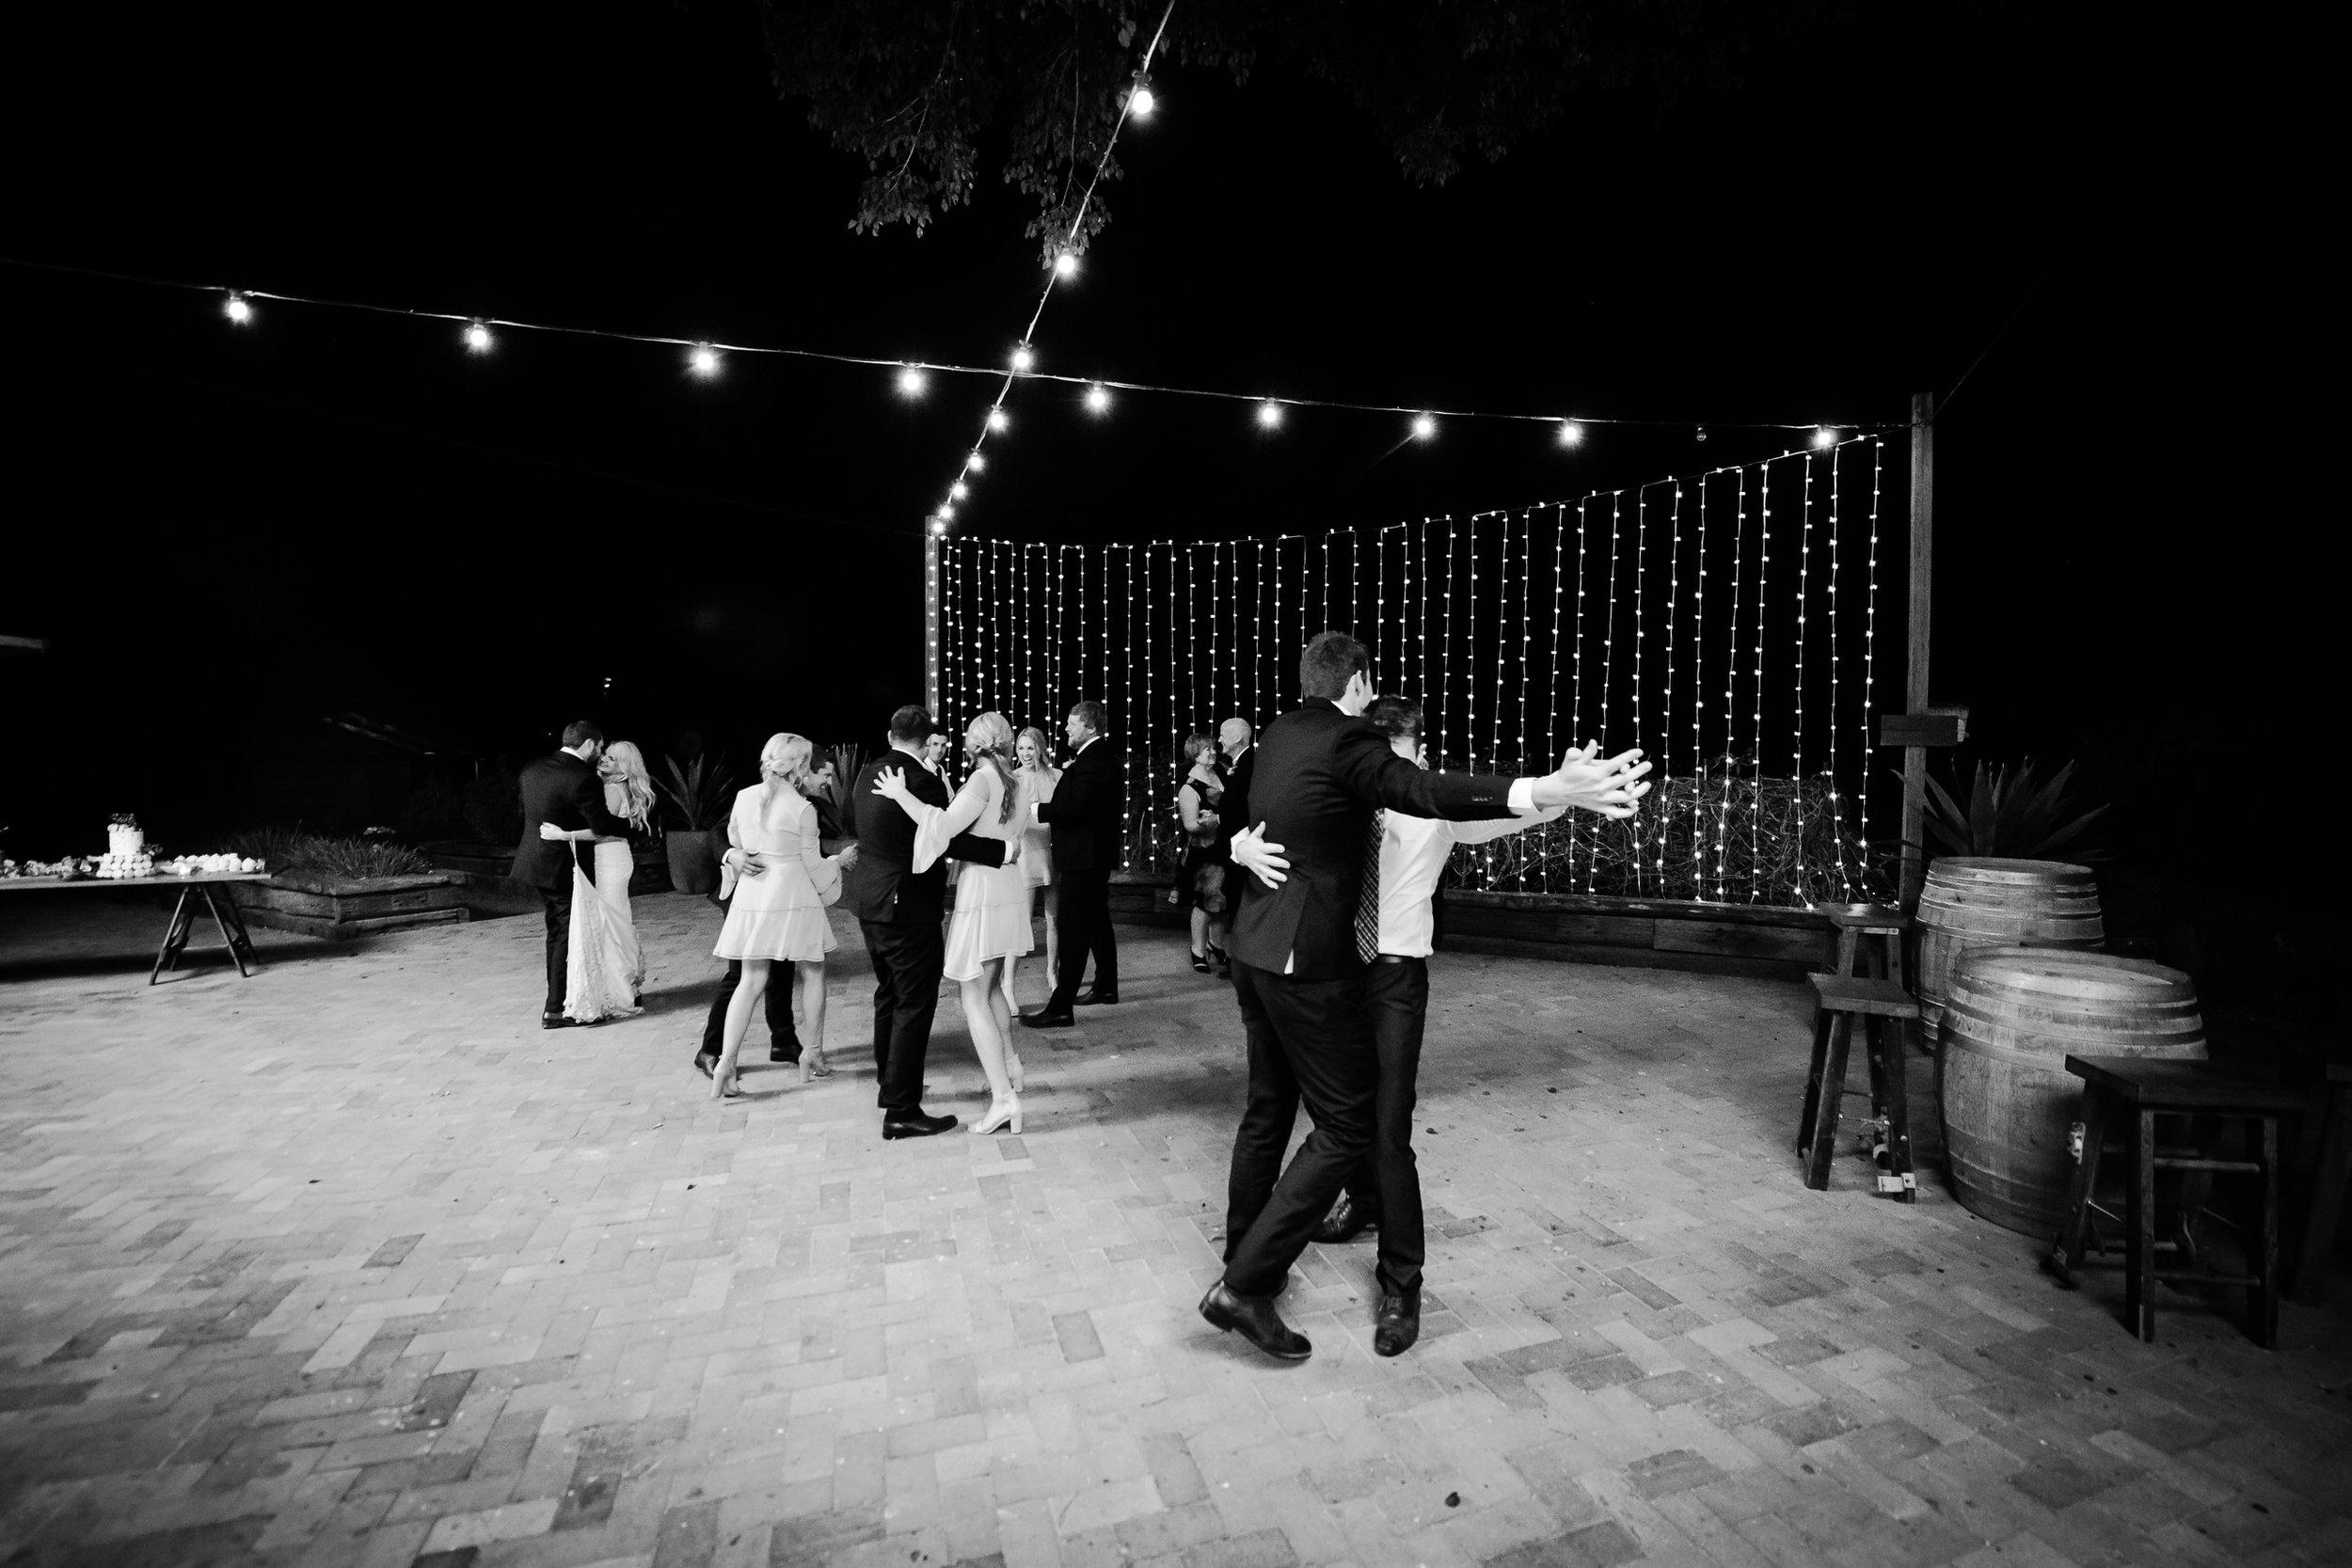 Justin_And_Jim_Photography_Byron_Bay_Wedding113.JPG